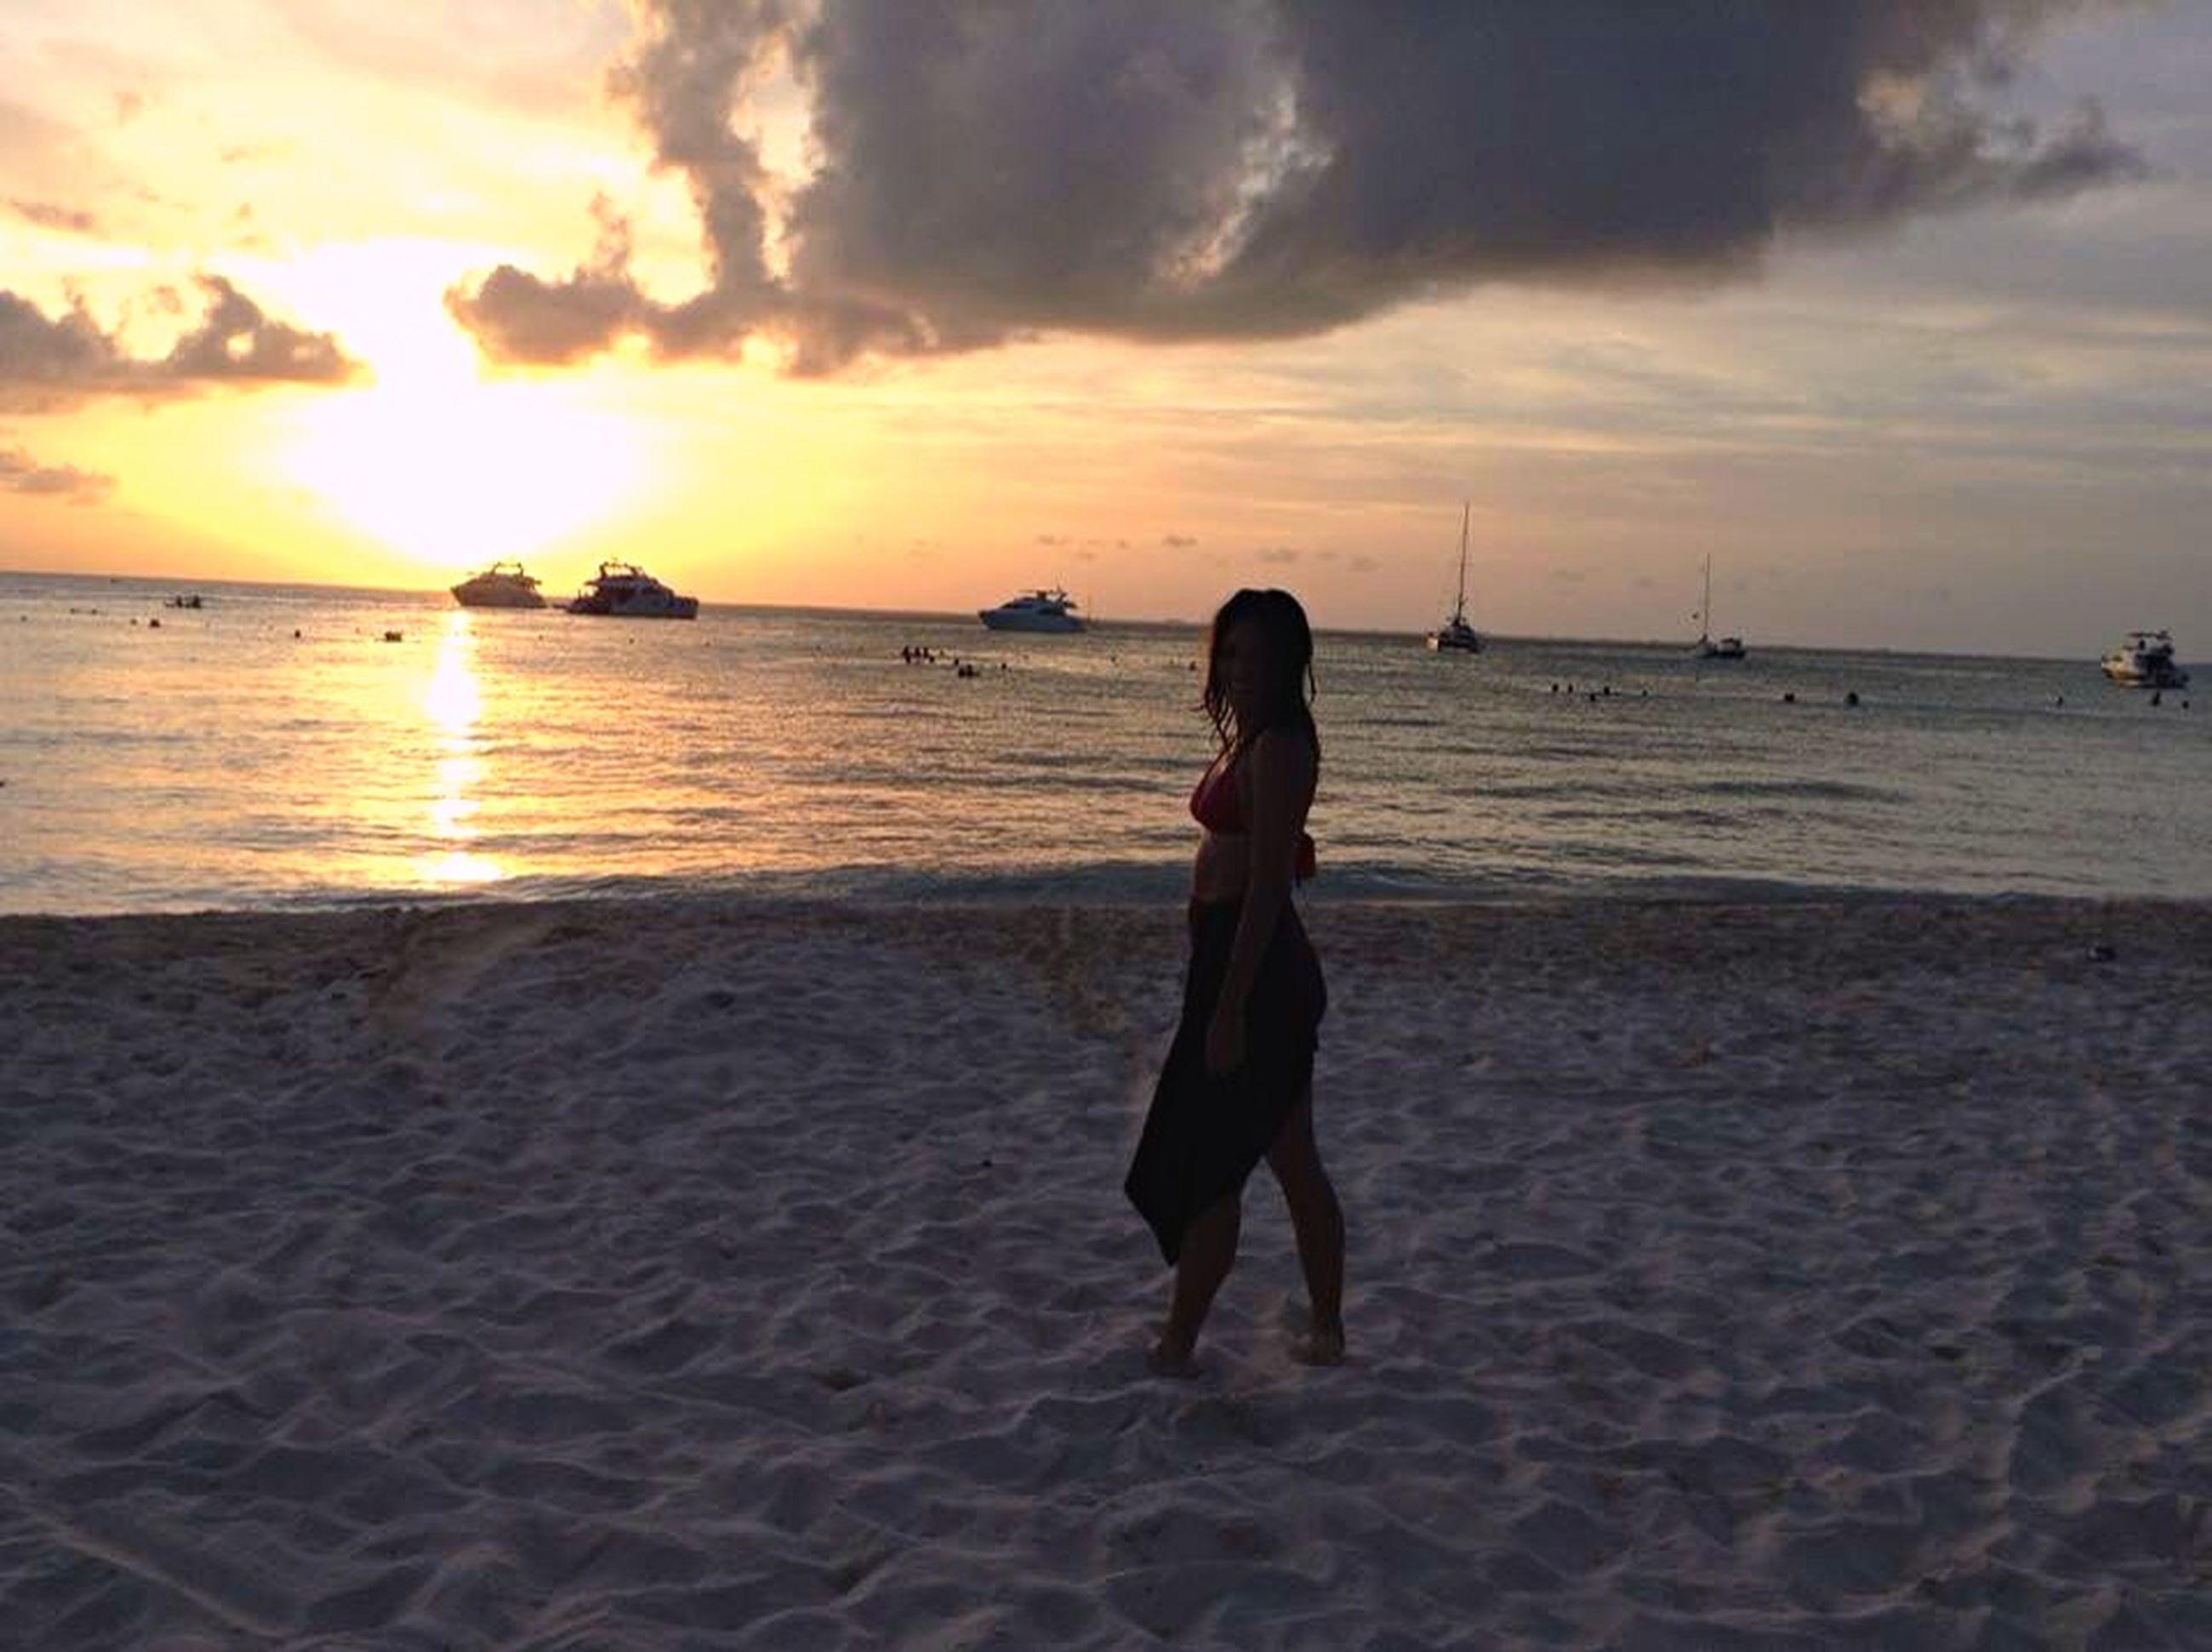 sunset, sea, beach, sky, water, shore, horizon over water, cloud - sky, lifestyles, leisure activity, scenics, full length, sand, cloud, beauty in nature, men, sun, standing